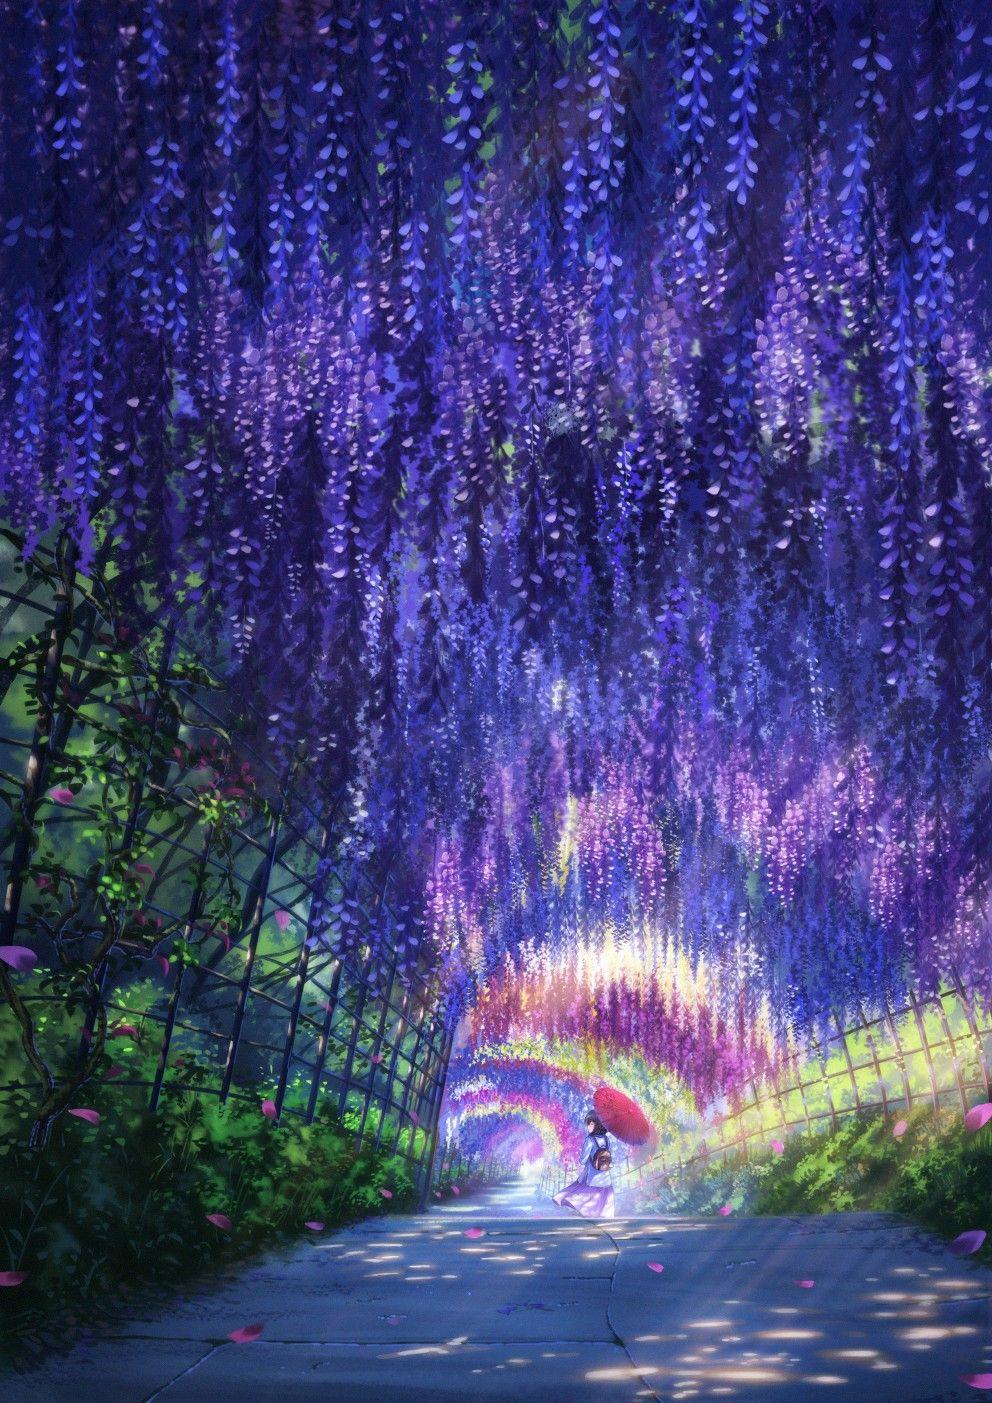 Anime sky Wallpapers Art image View Beautiful